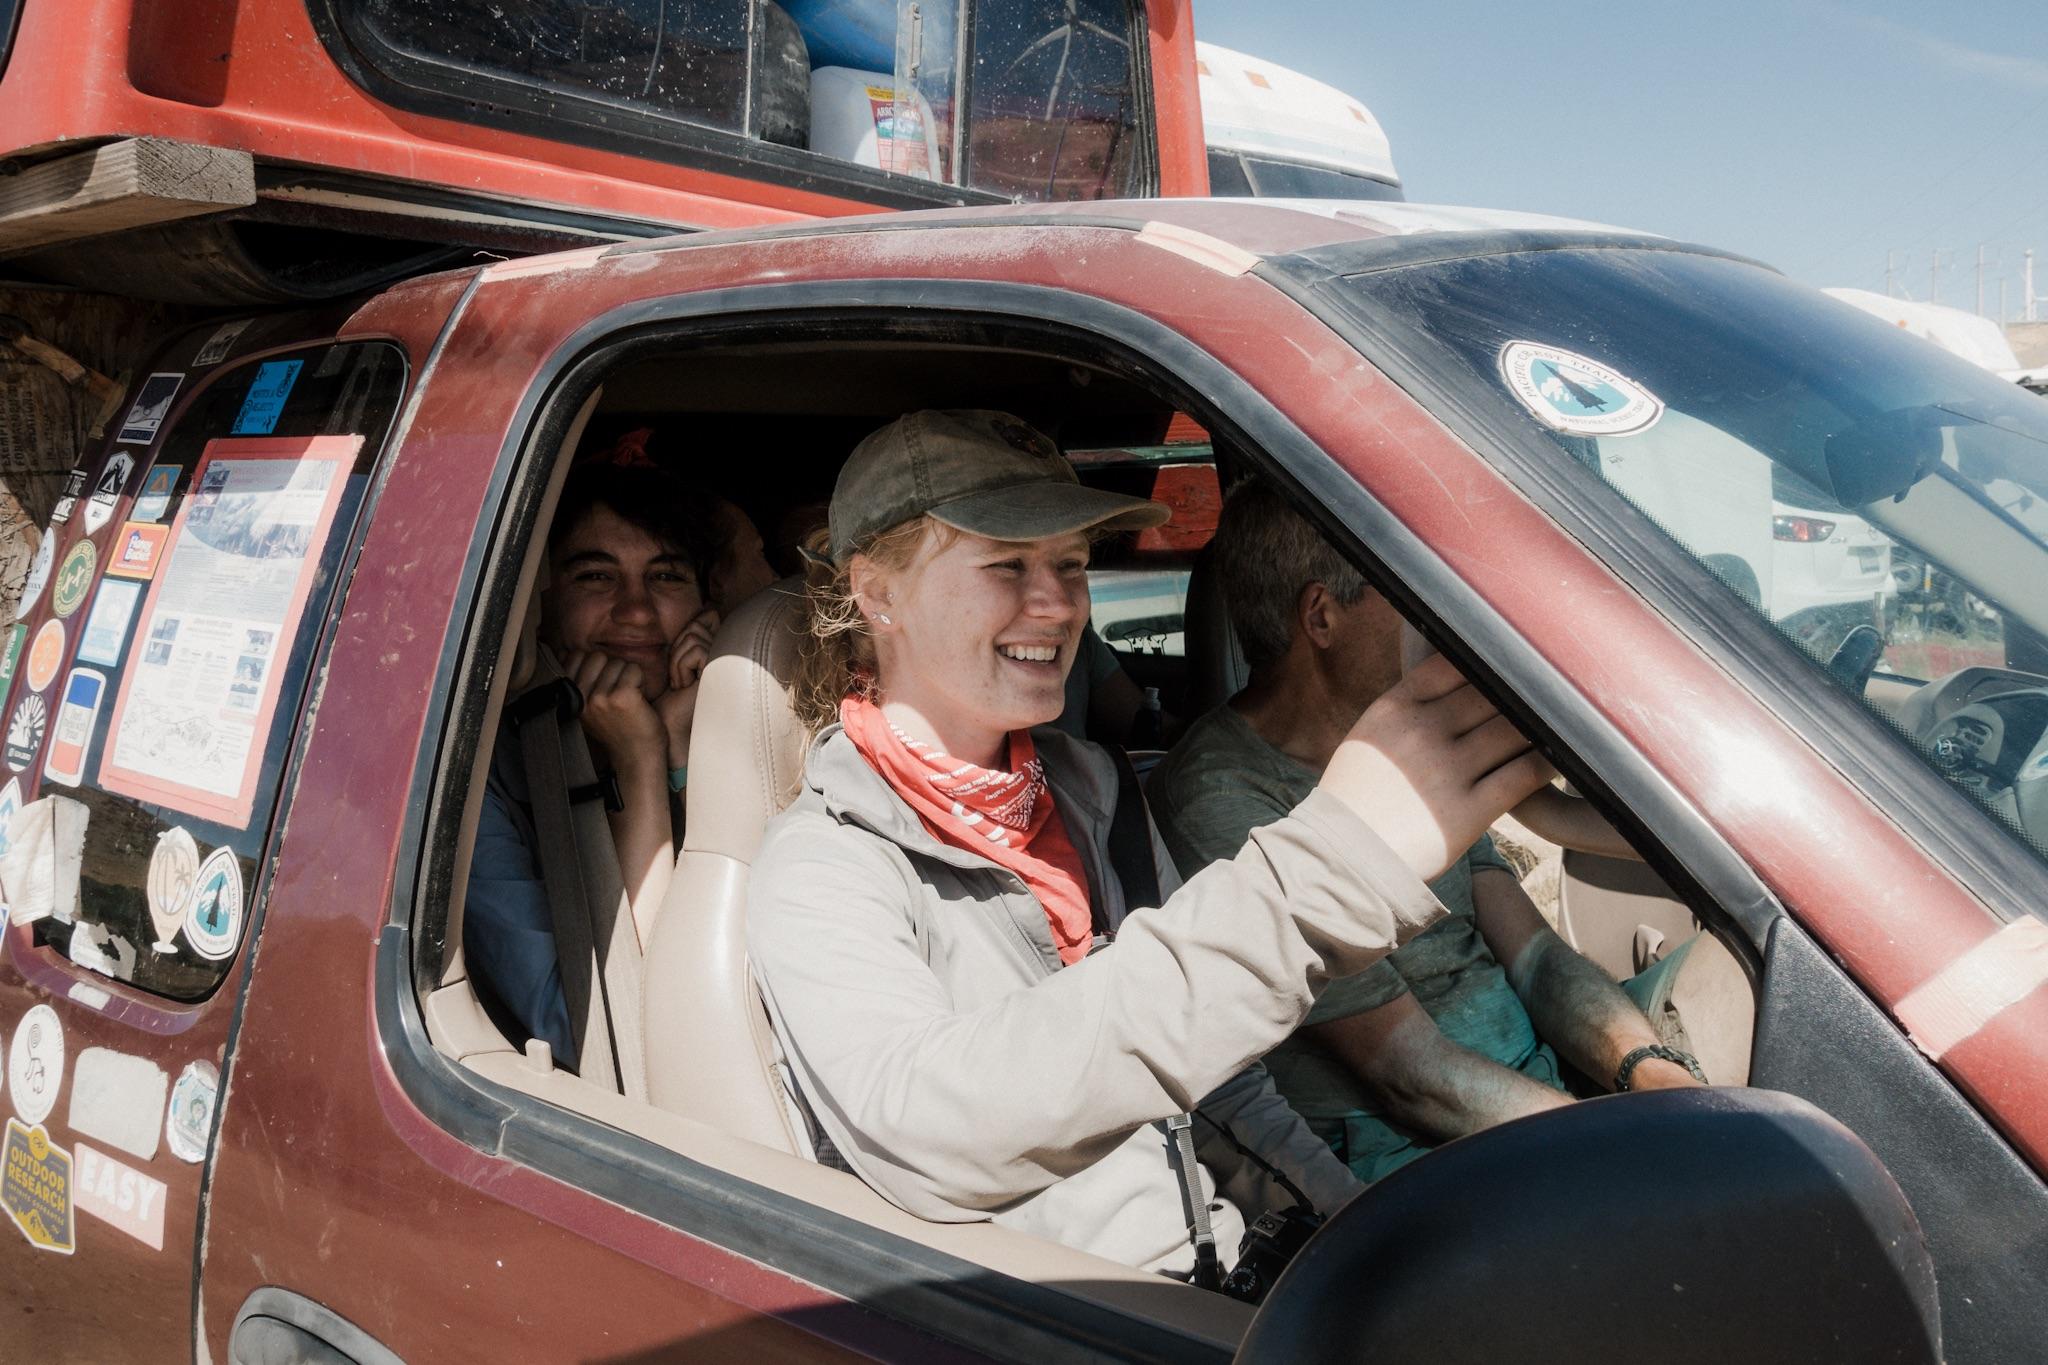 Girls getting a ride in Legend's truck.